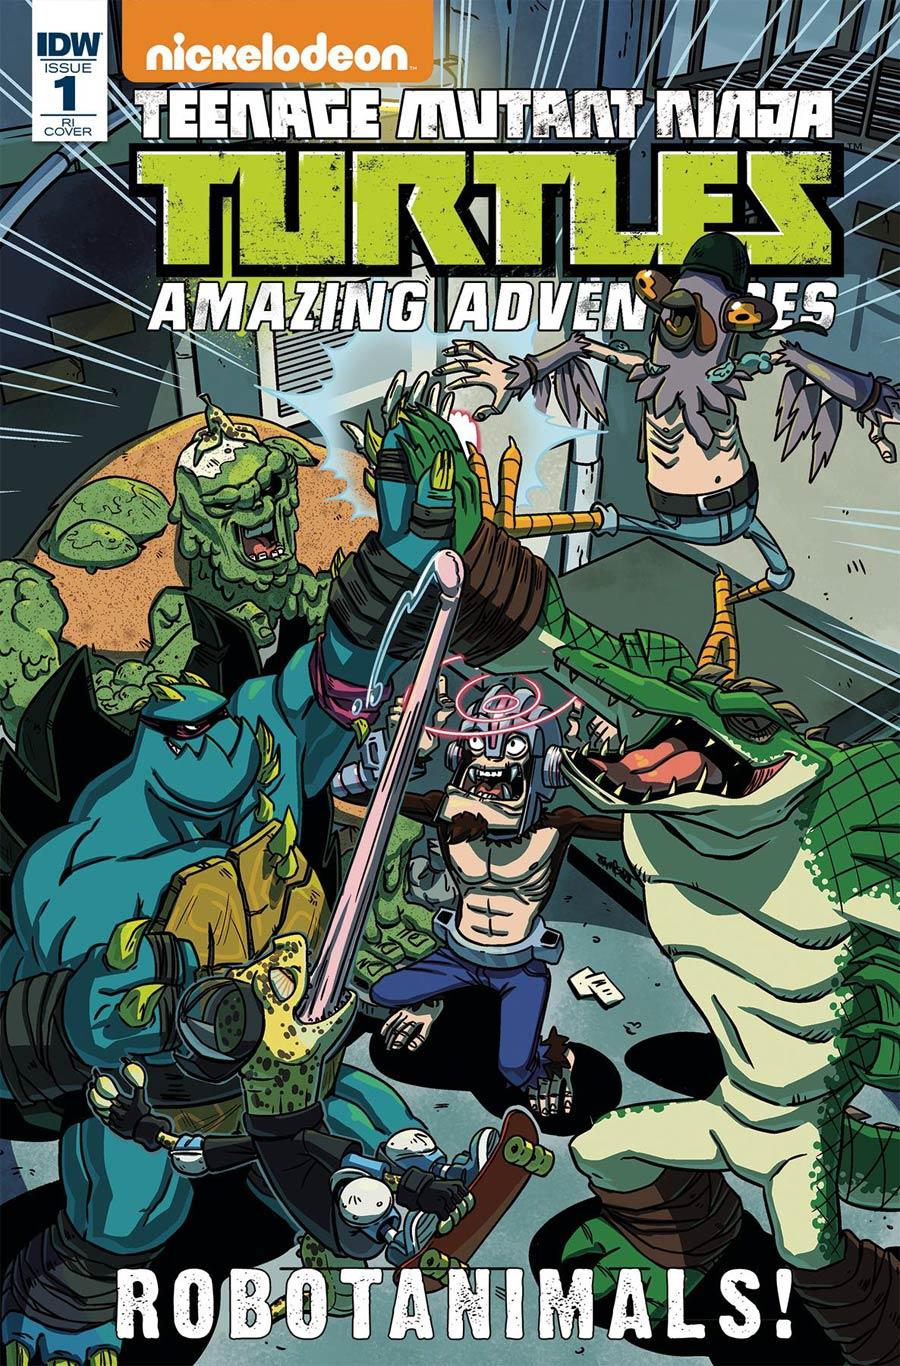 Teenage Mutant Ninja Turtles Amazing Adventures Robotanimals #1 Cover C Incentive Ryan Jampole Variant Cover